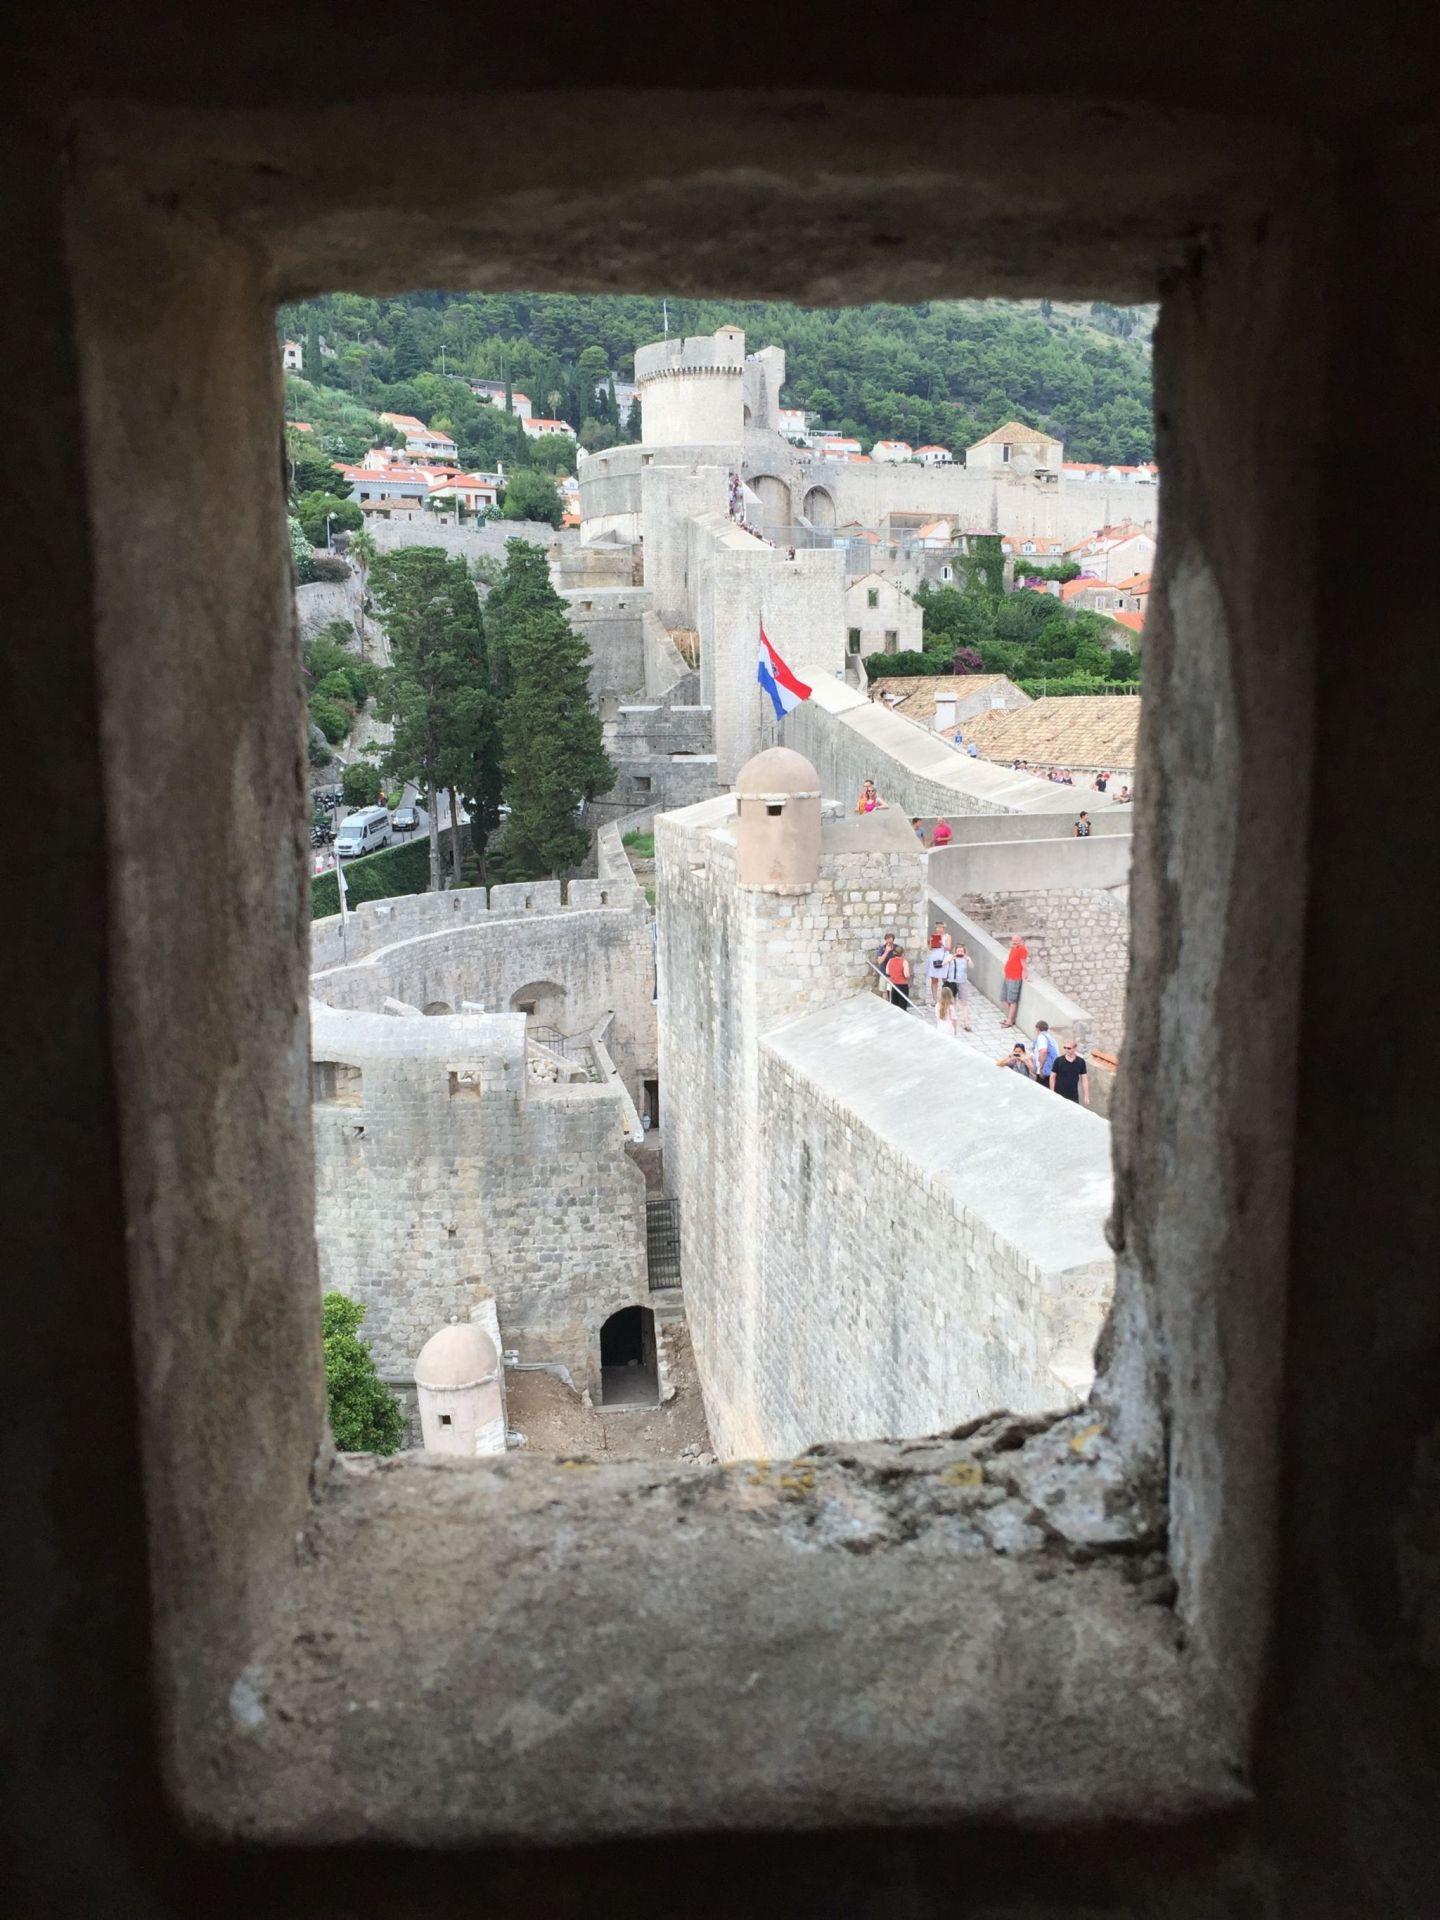 City Walls in Dubrovnik, Croatia